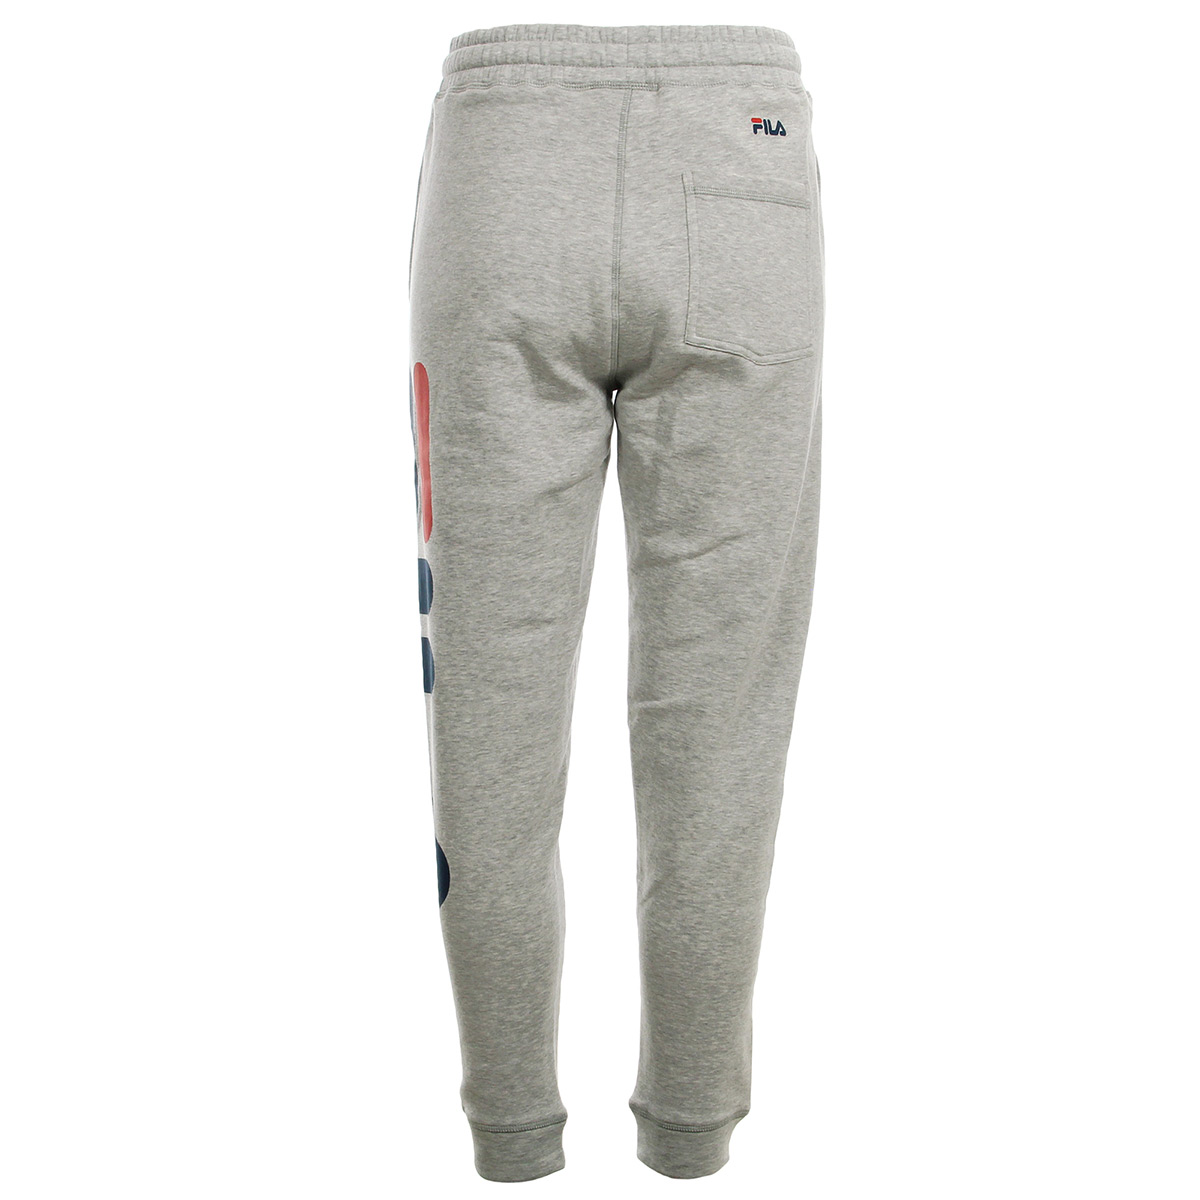 Fila Classic Basic Pants 681275B13, Pantalons